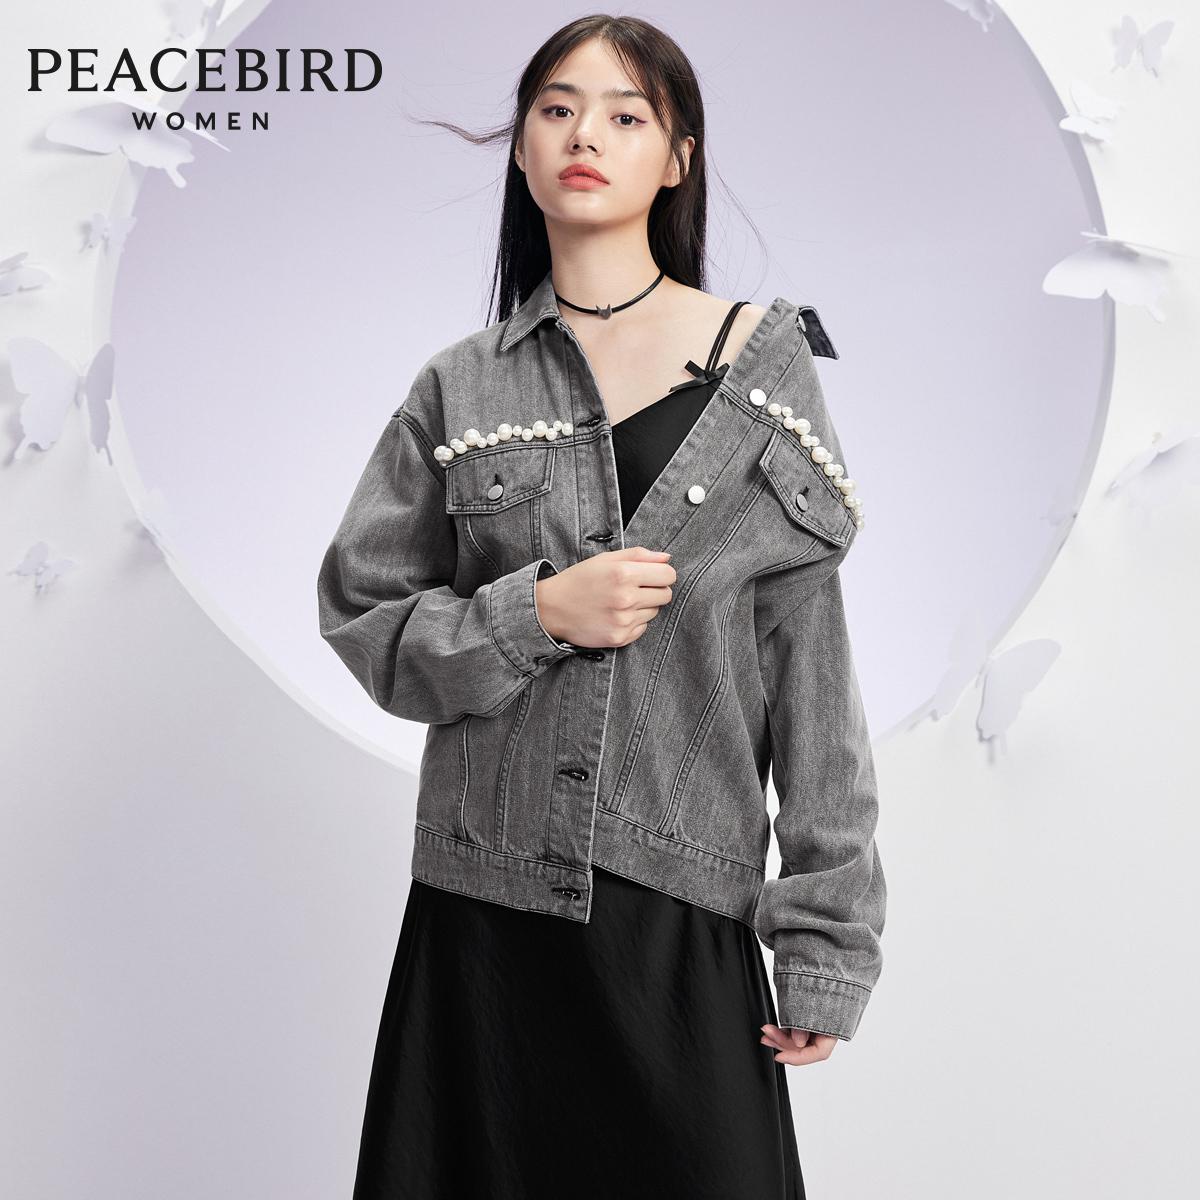 PEACEBIRD 太平鸟 女式珍珠牛仔外套 天猫优惠券折后¥279.9包邮(¥299.9-20)